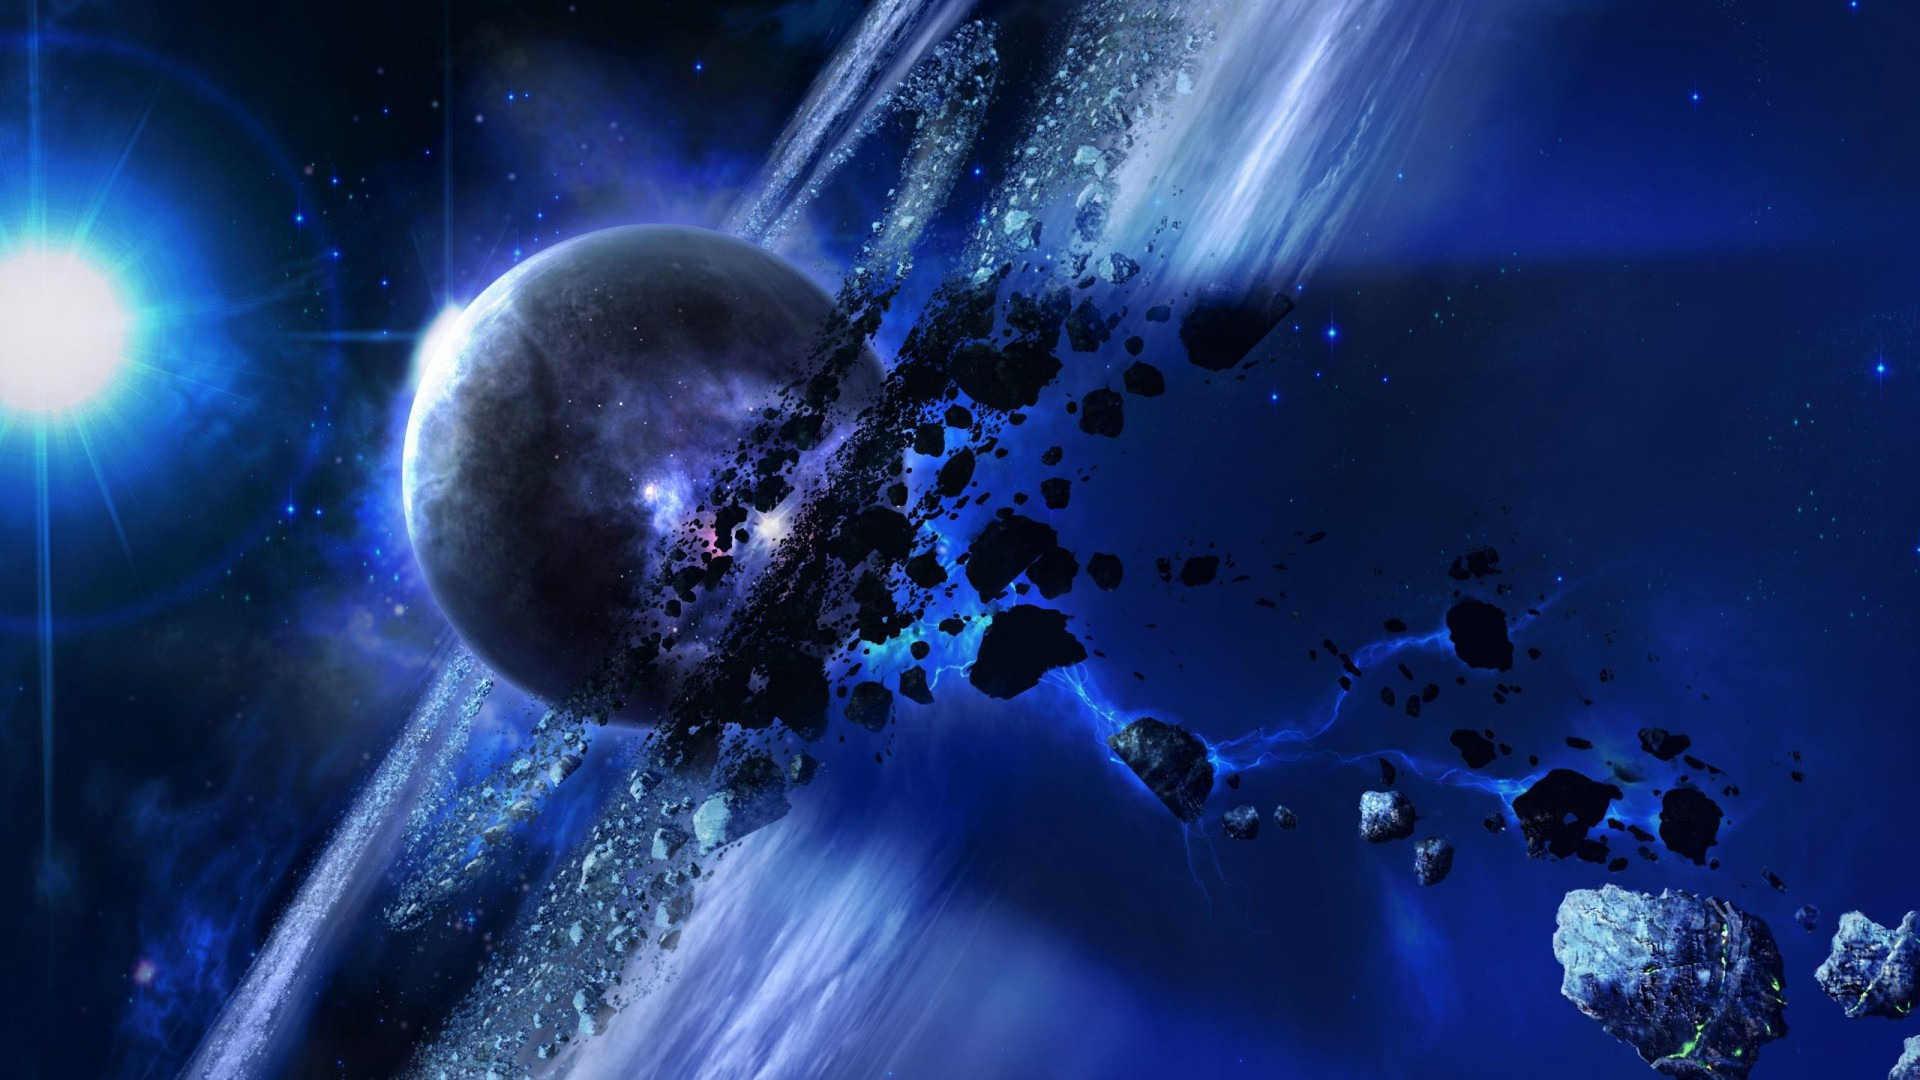 Meteorites Cosmos Sci Fi Wallpaper